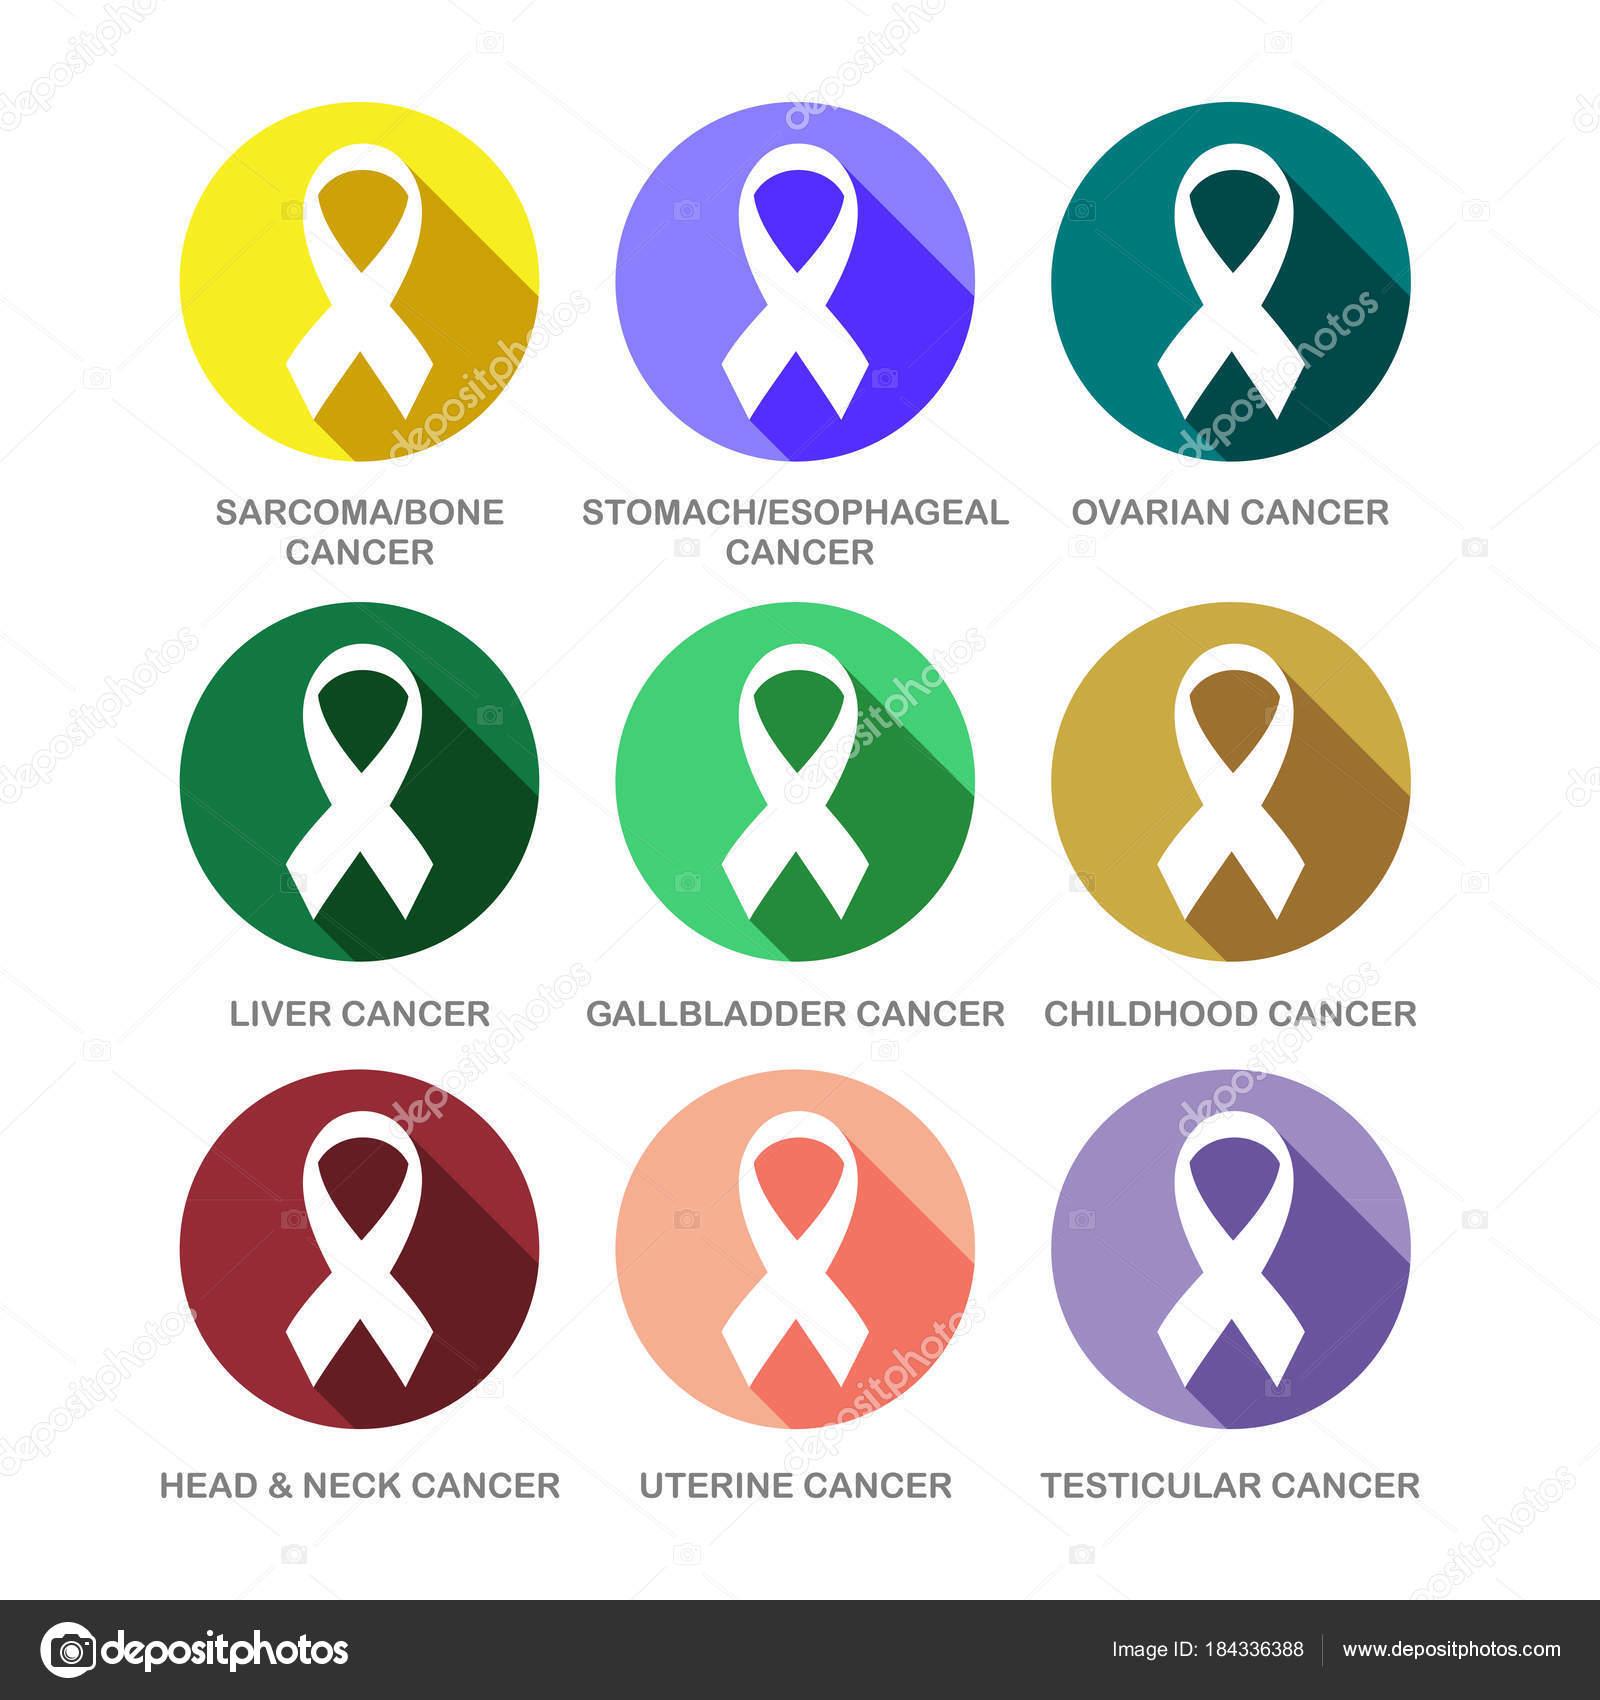 Leiomiosarcoma Uterino Download